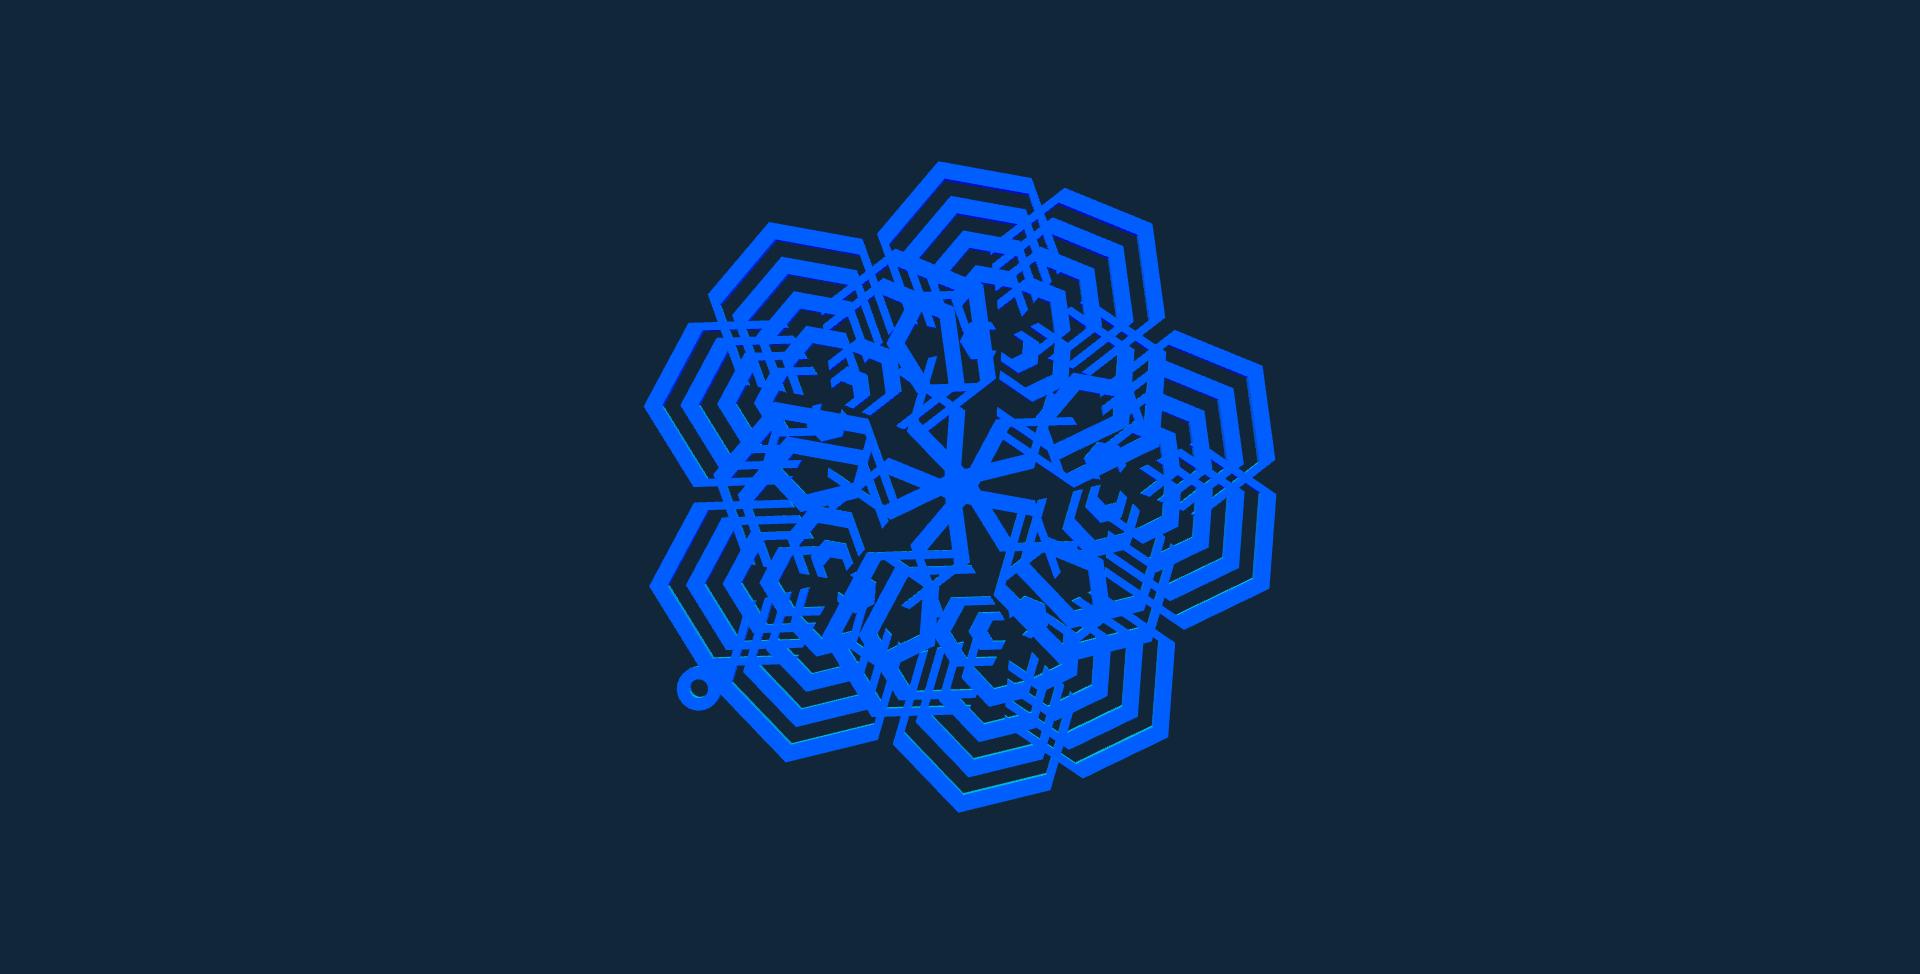 Snowflake design 8 stl file